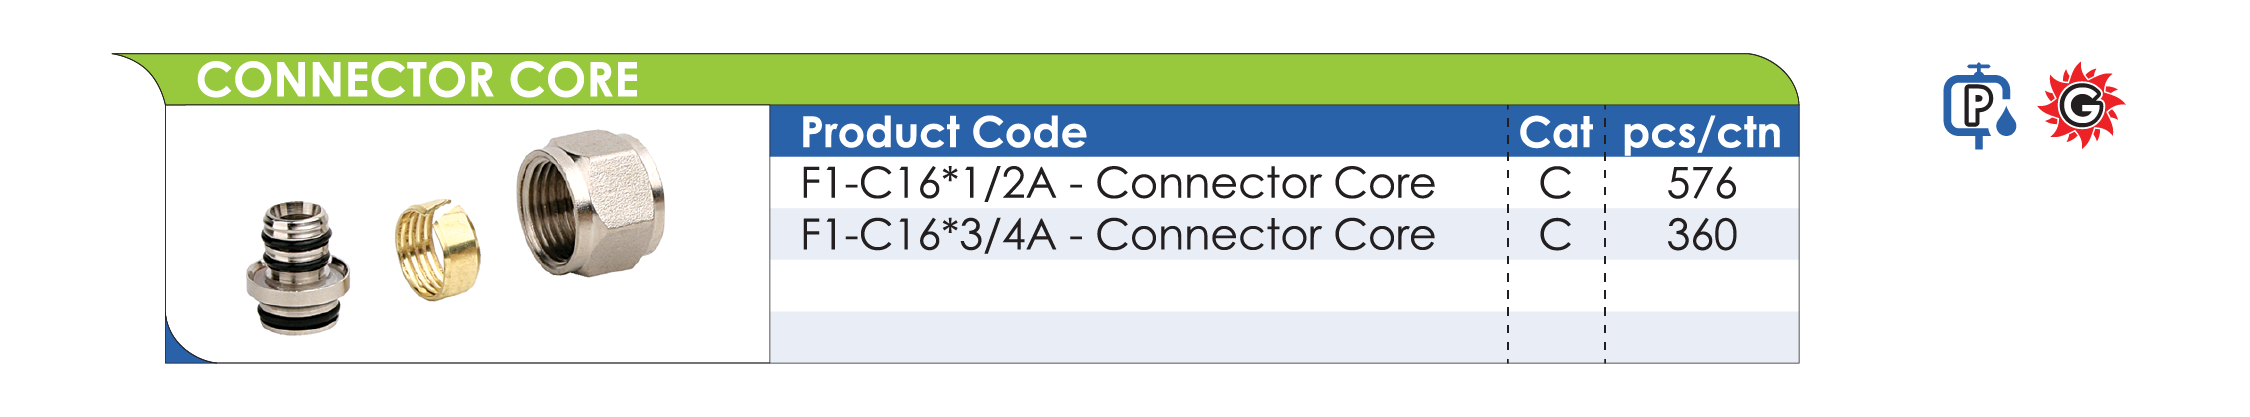 fittings16conectcore-01